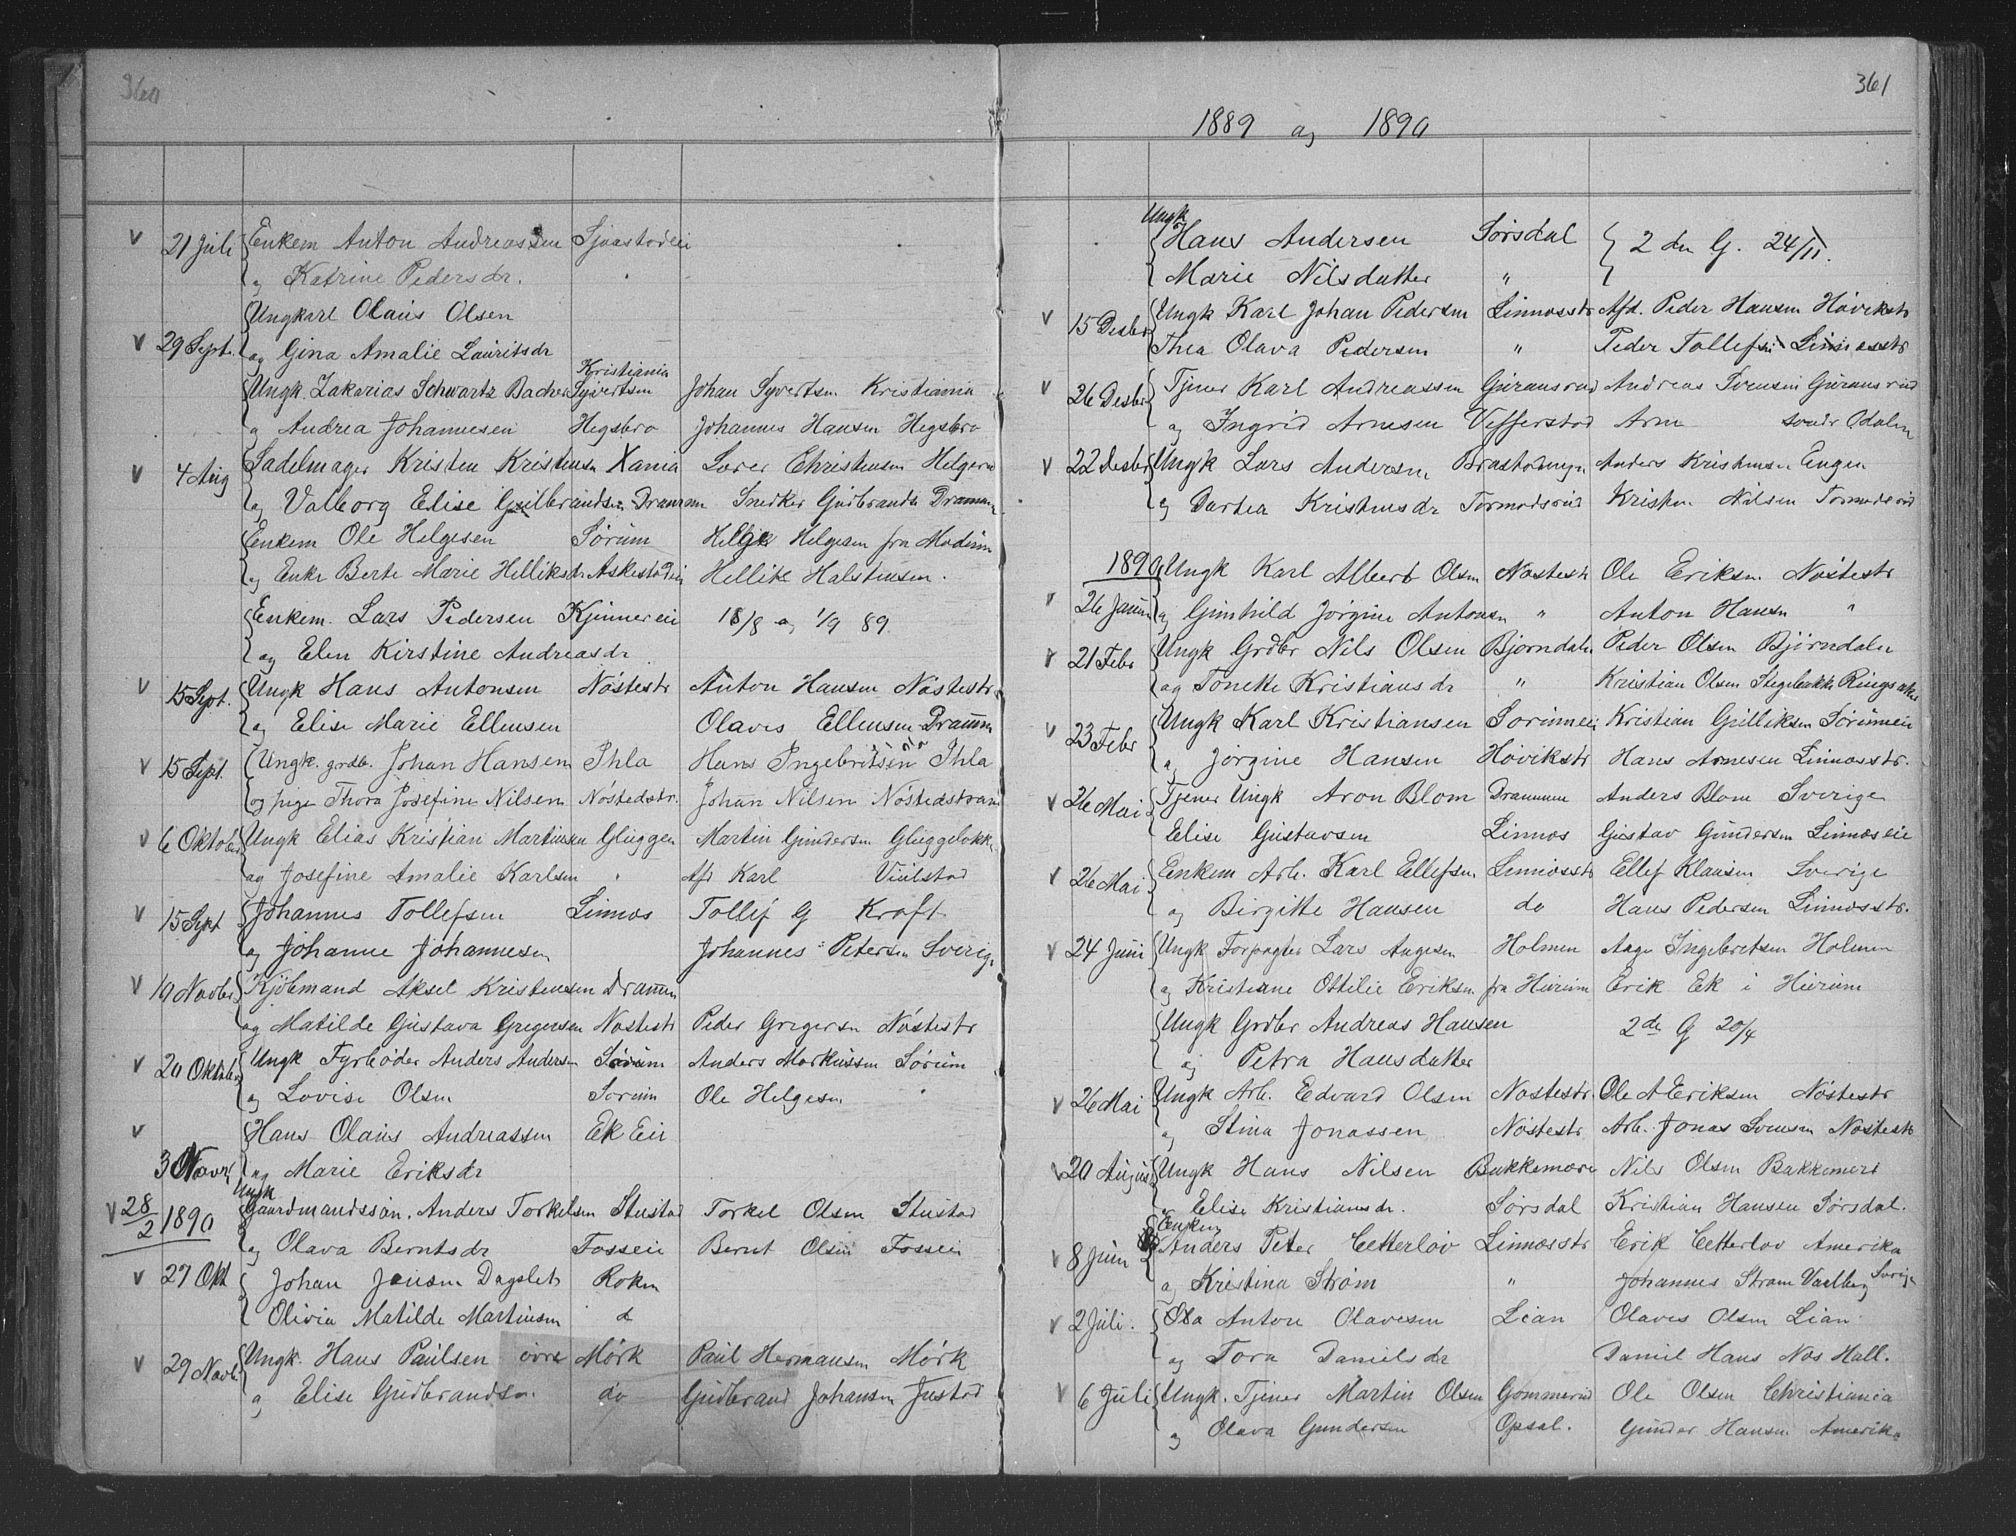 SAKO, Lier kirkebøker, G/Gb/L0001: Klokkerbok nr. II 1, 1874-1898, s. 360-361